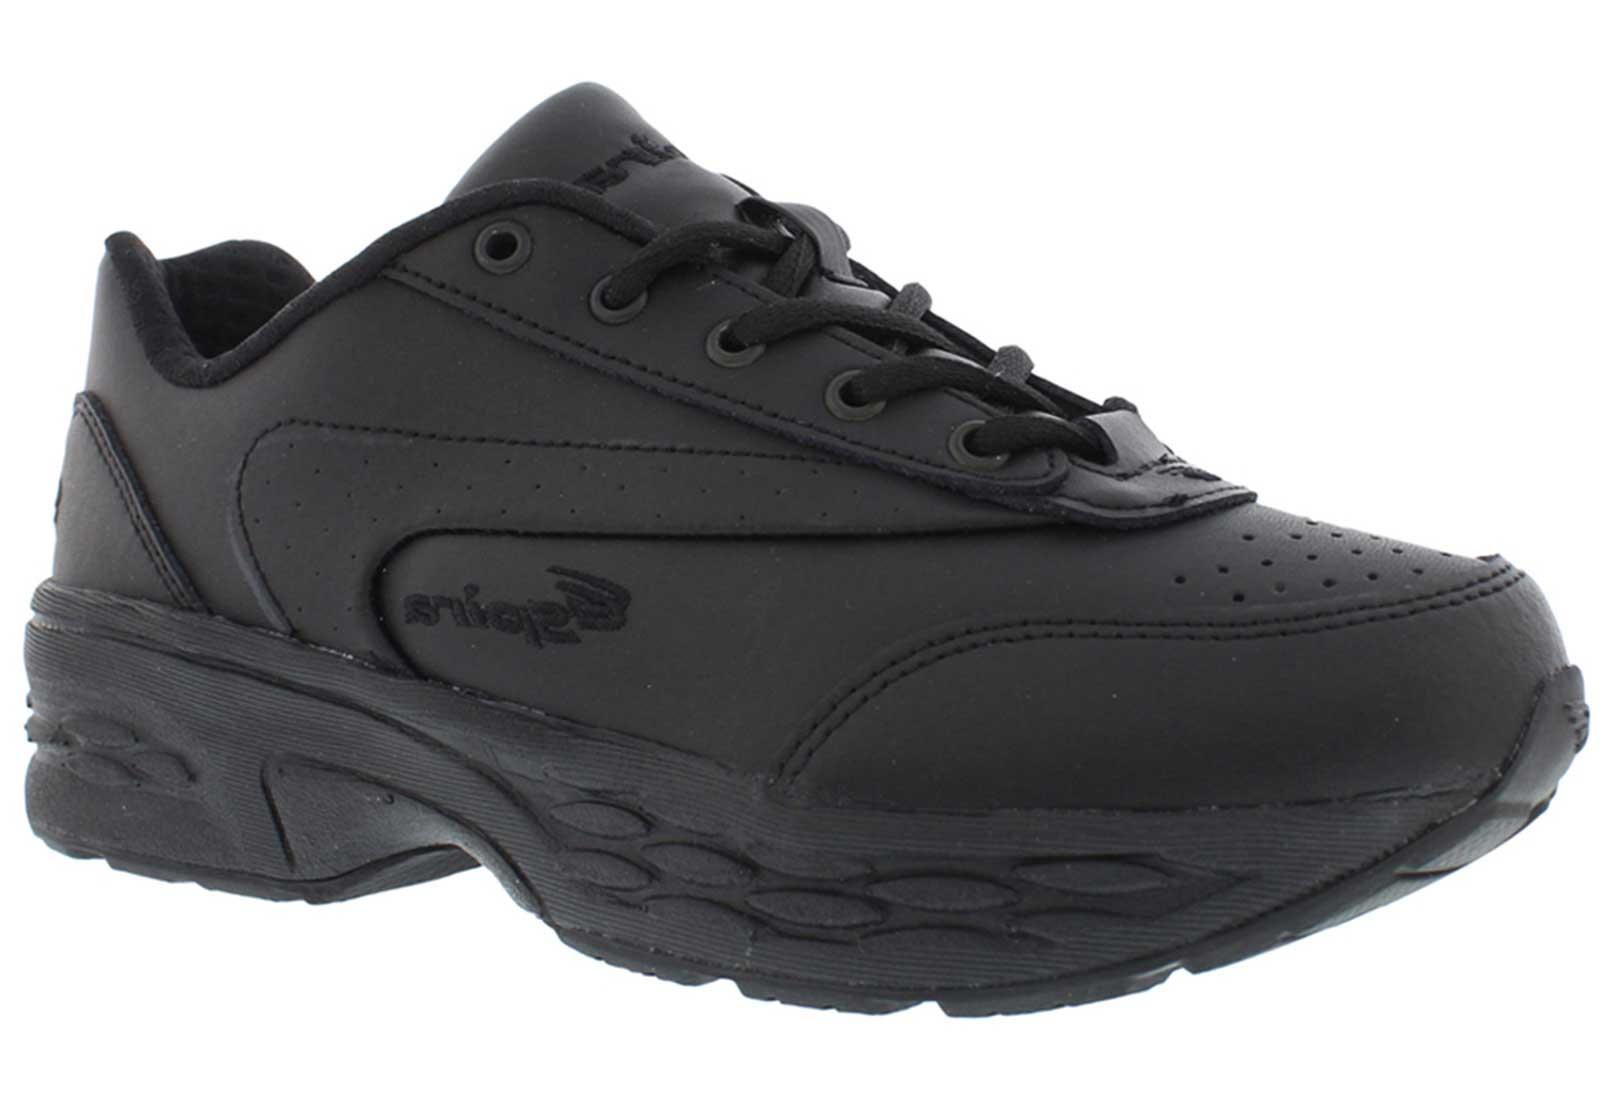 Classic Walker SWC202 Walking Shoes